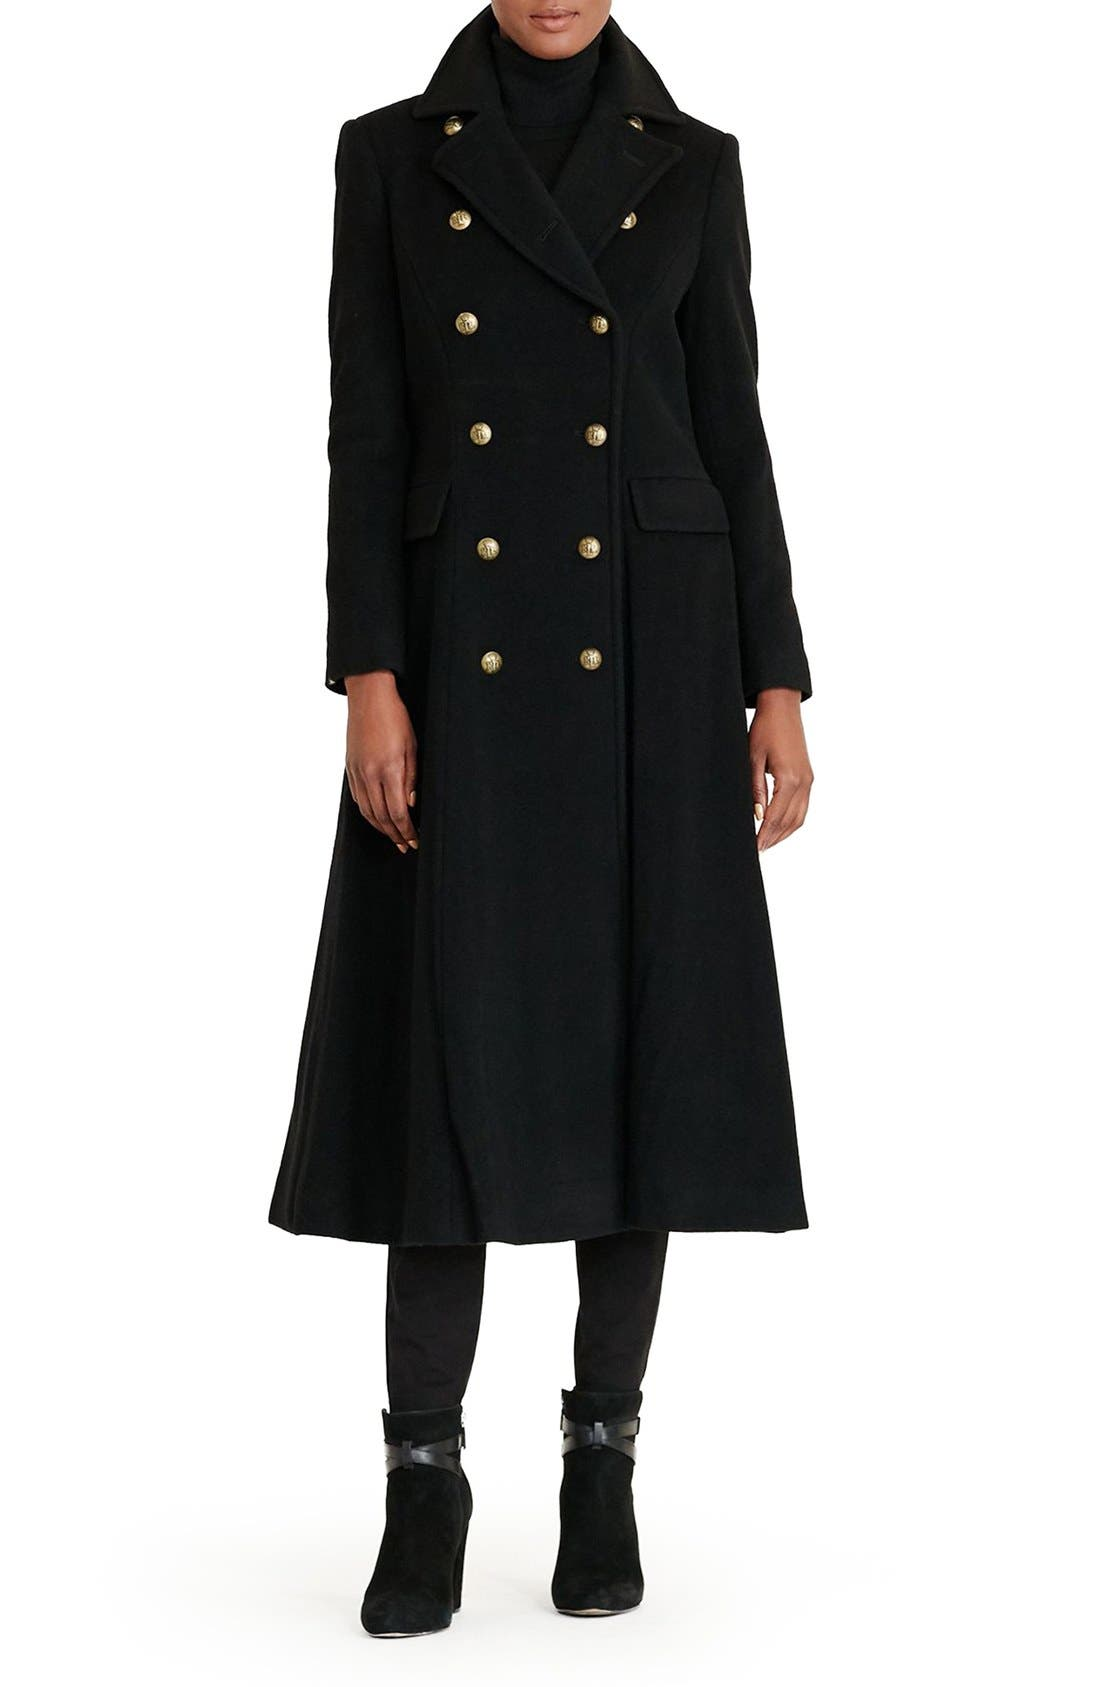 Alternate Image 1 Selected - Lauren Ralph Lauren Double Breasted Military Maxi Coat